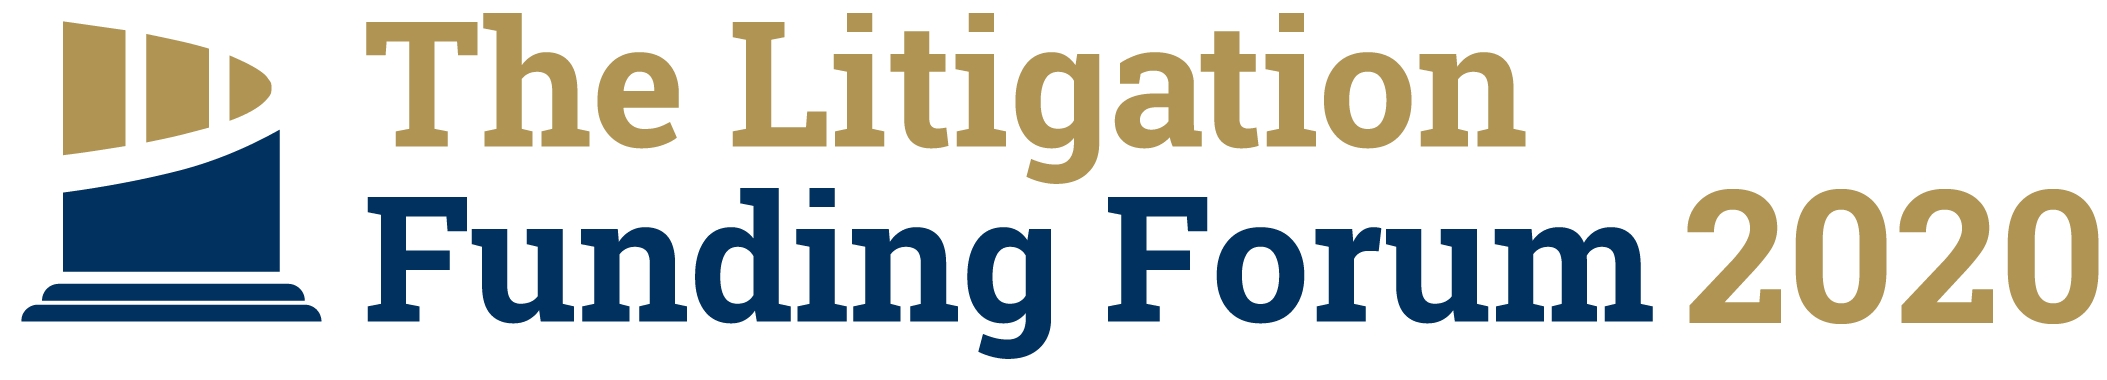 The Litigation Funding Forum 2020